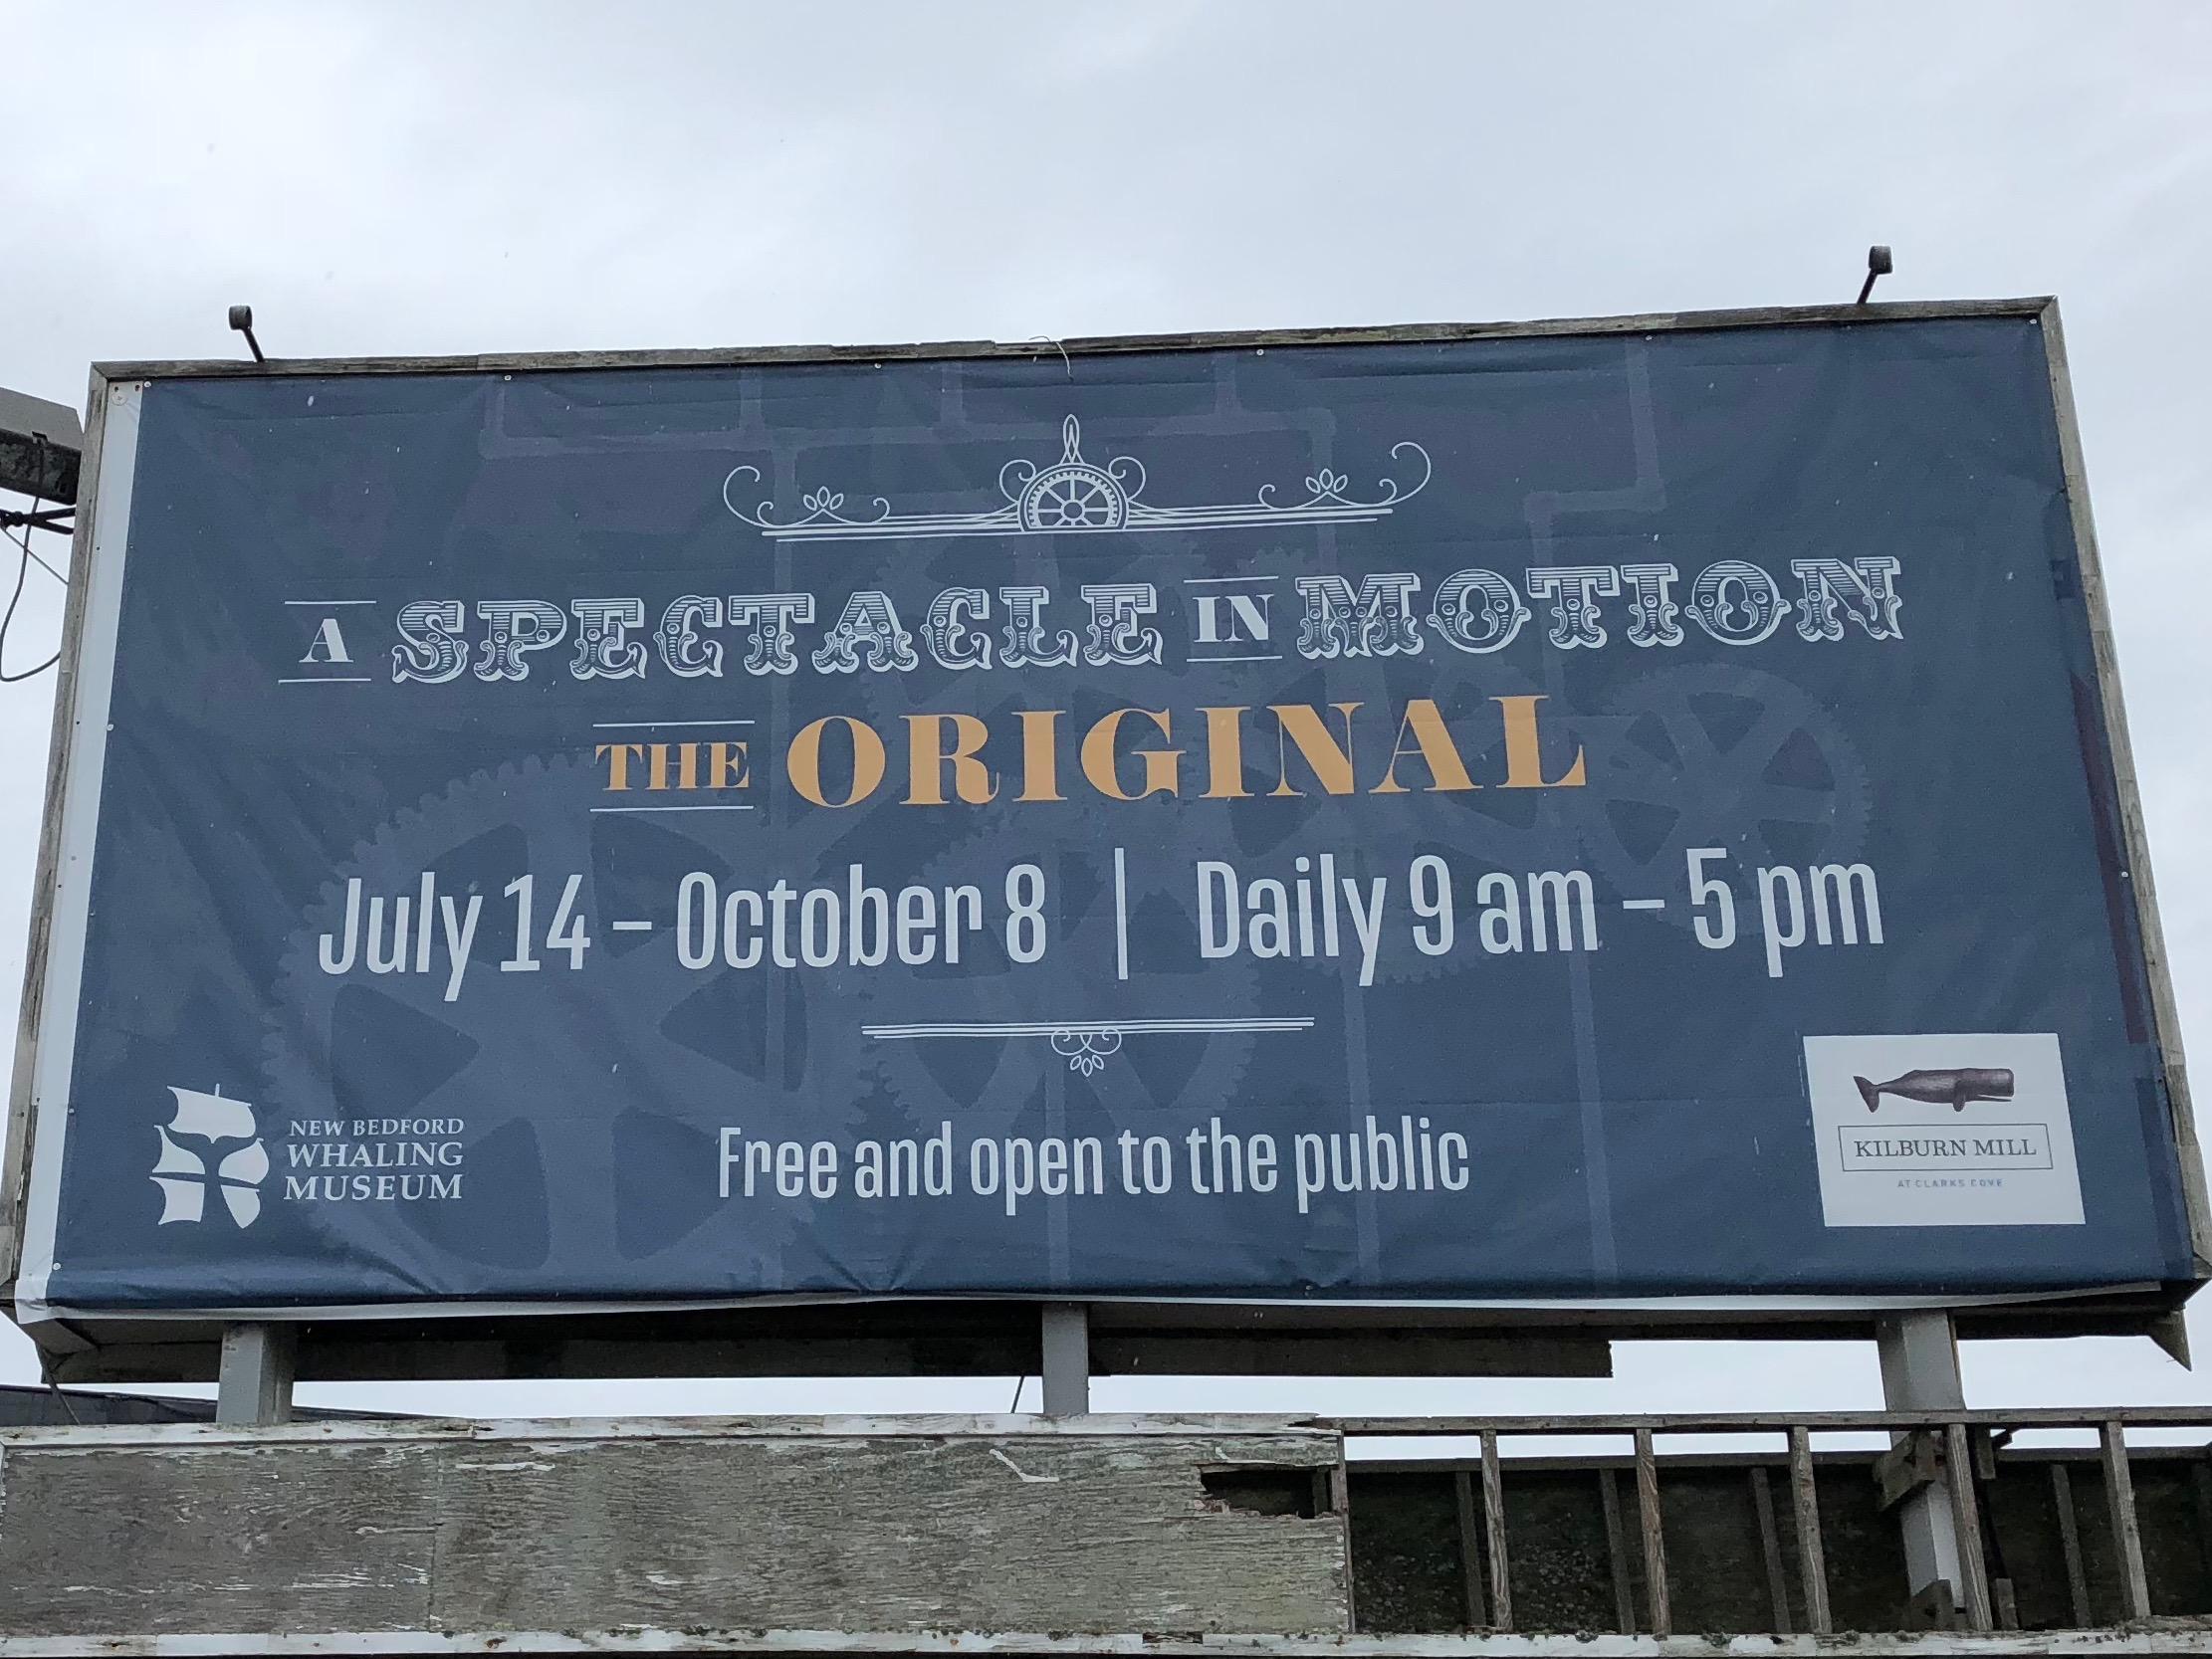 092518-Panorama-billboard-New-Bedford